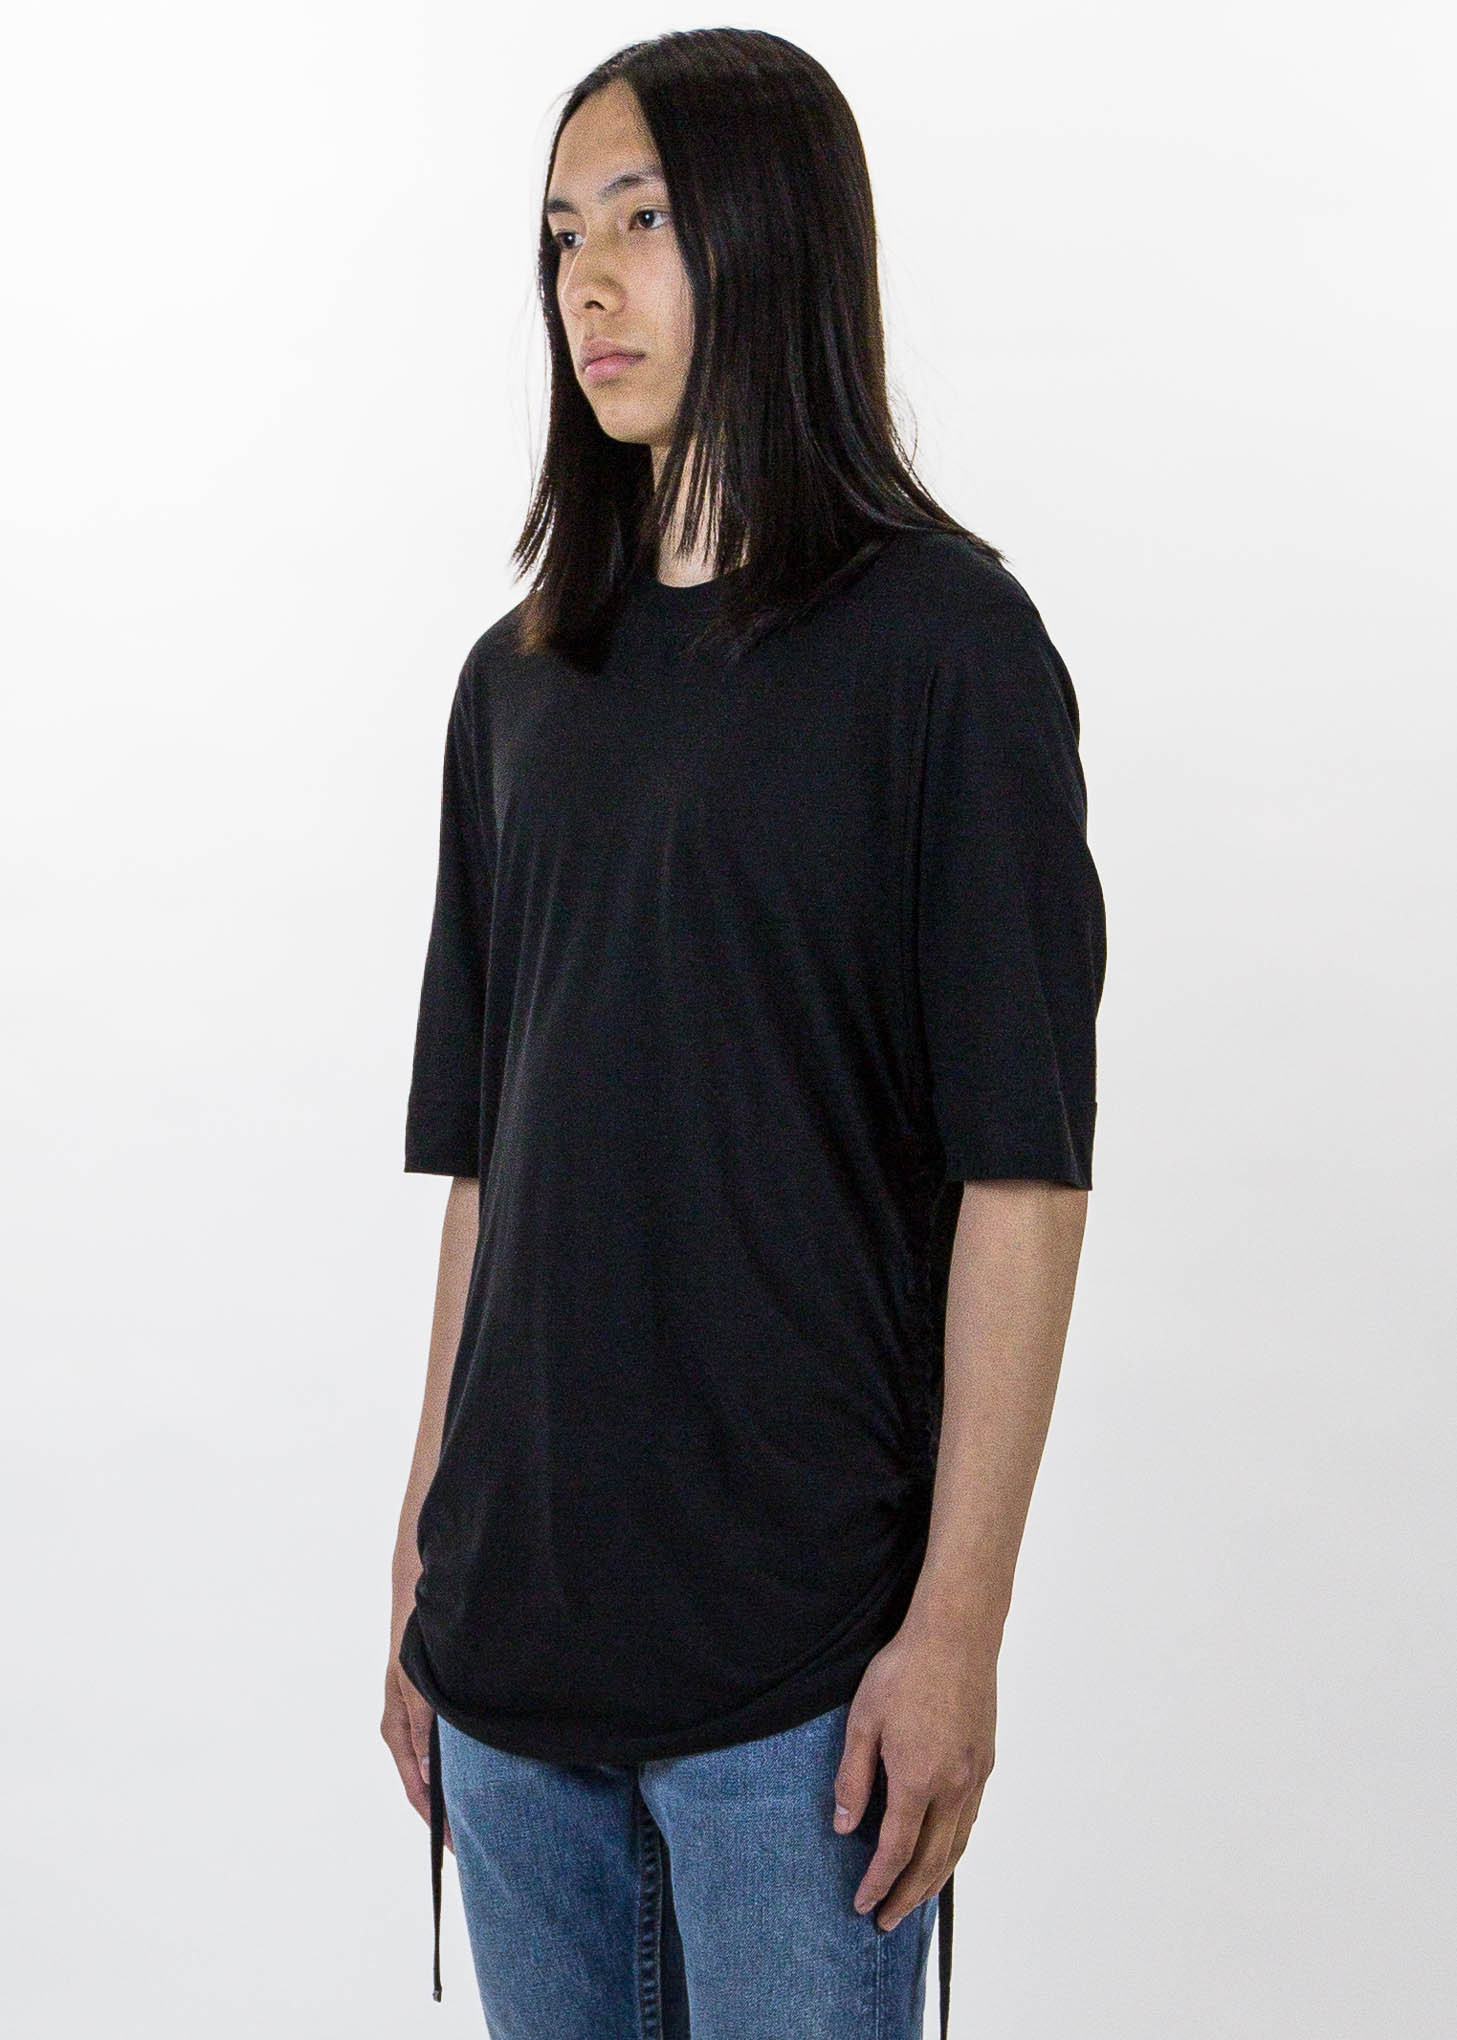 Helmut lang black drawcord t shirt garmentory for Helmut lang tee shirts